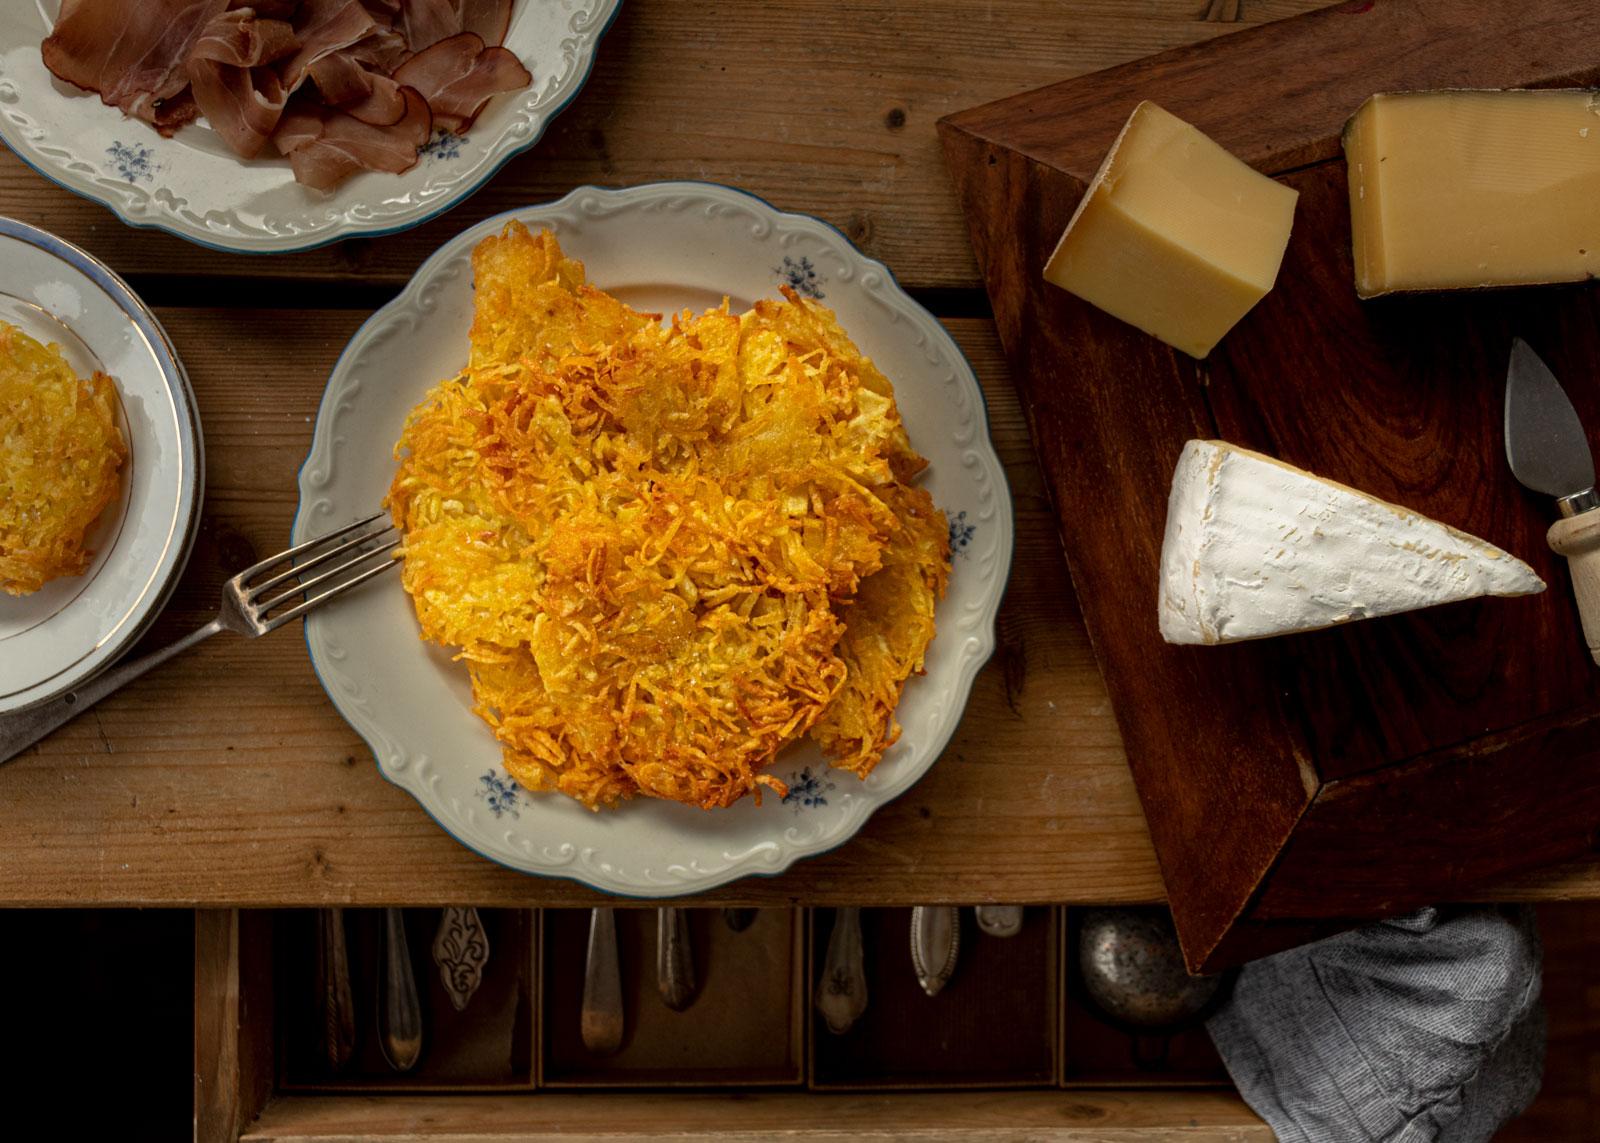 Kartoffelpuffer nach Trentiner Art - tortel di patate